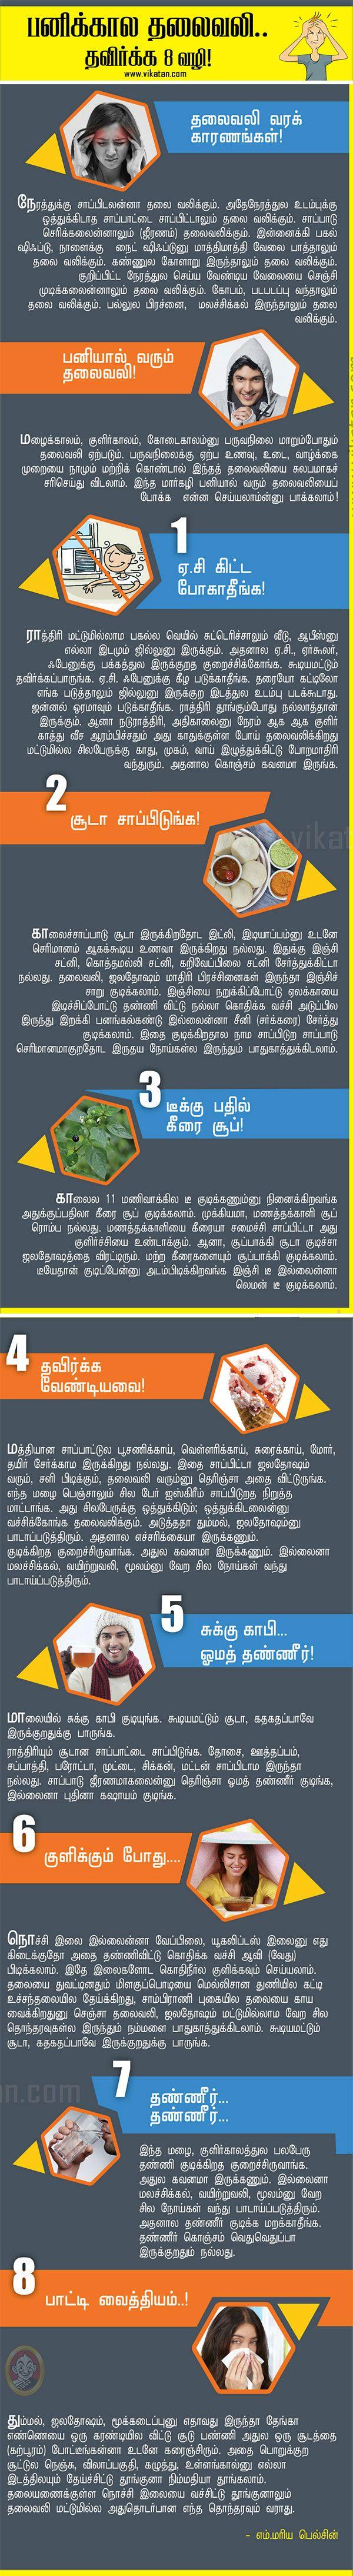 8 ways to avoid Winter headache! | பனிக்கால தலைவலி... தவிர்க்க 8 வழி!